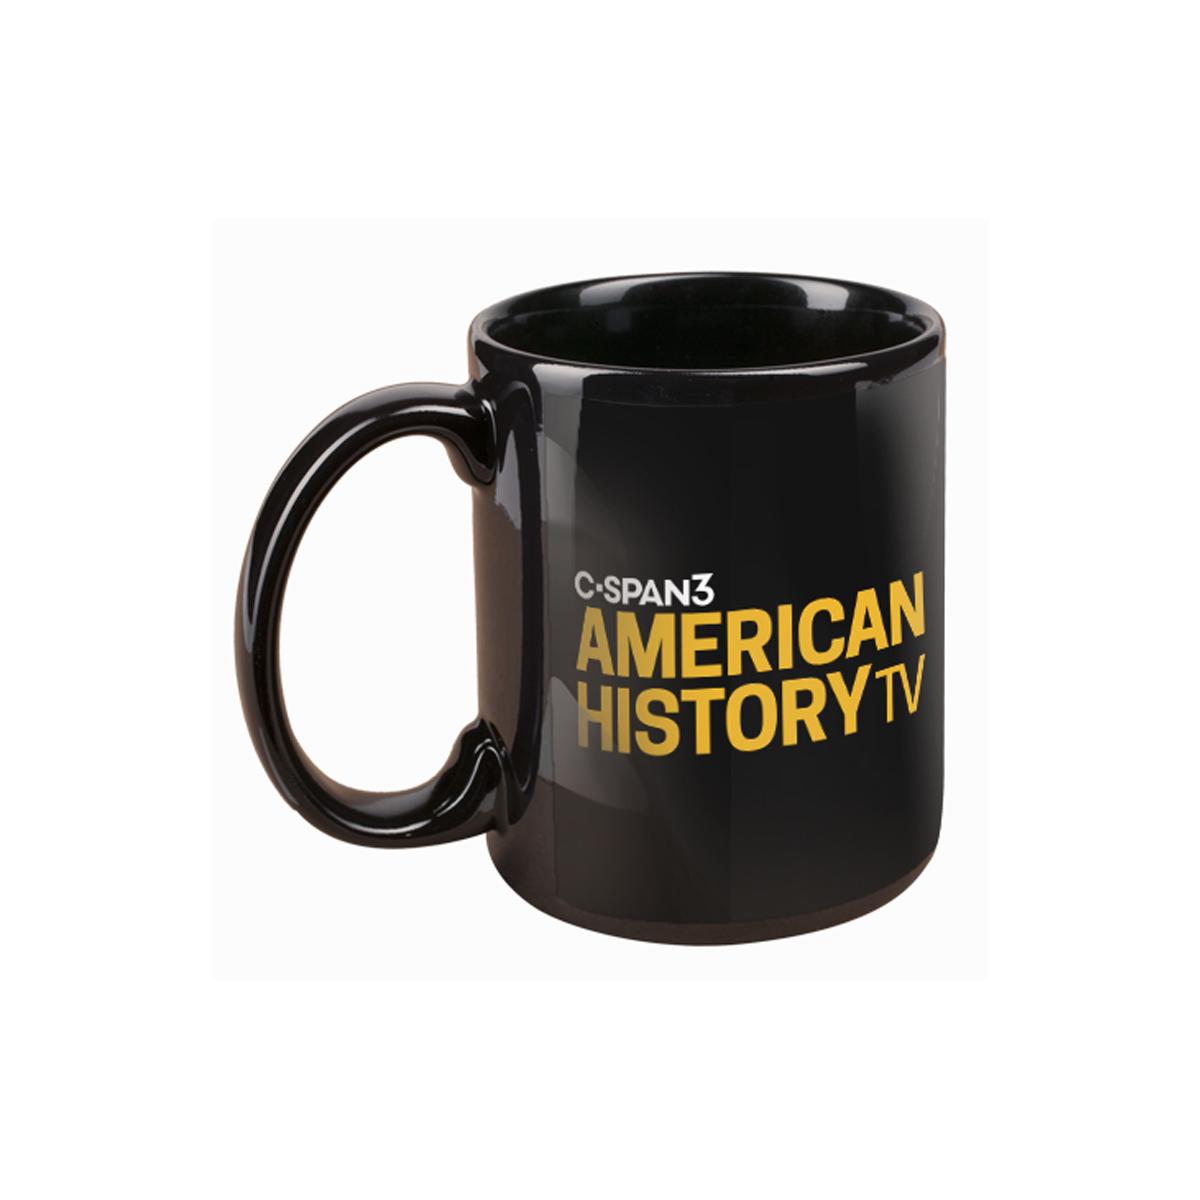 C-SPAN3 American History TV Logo Mug